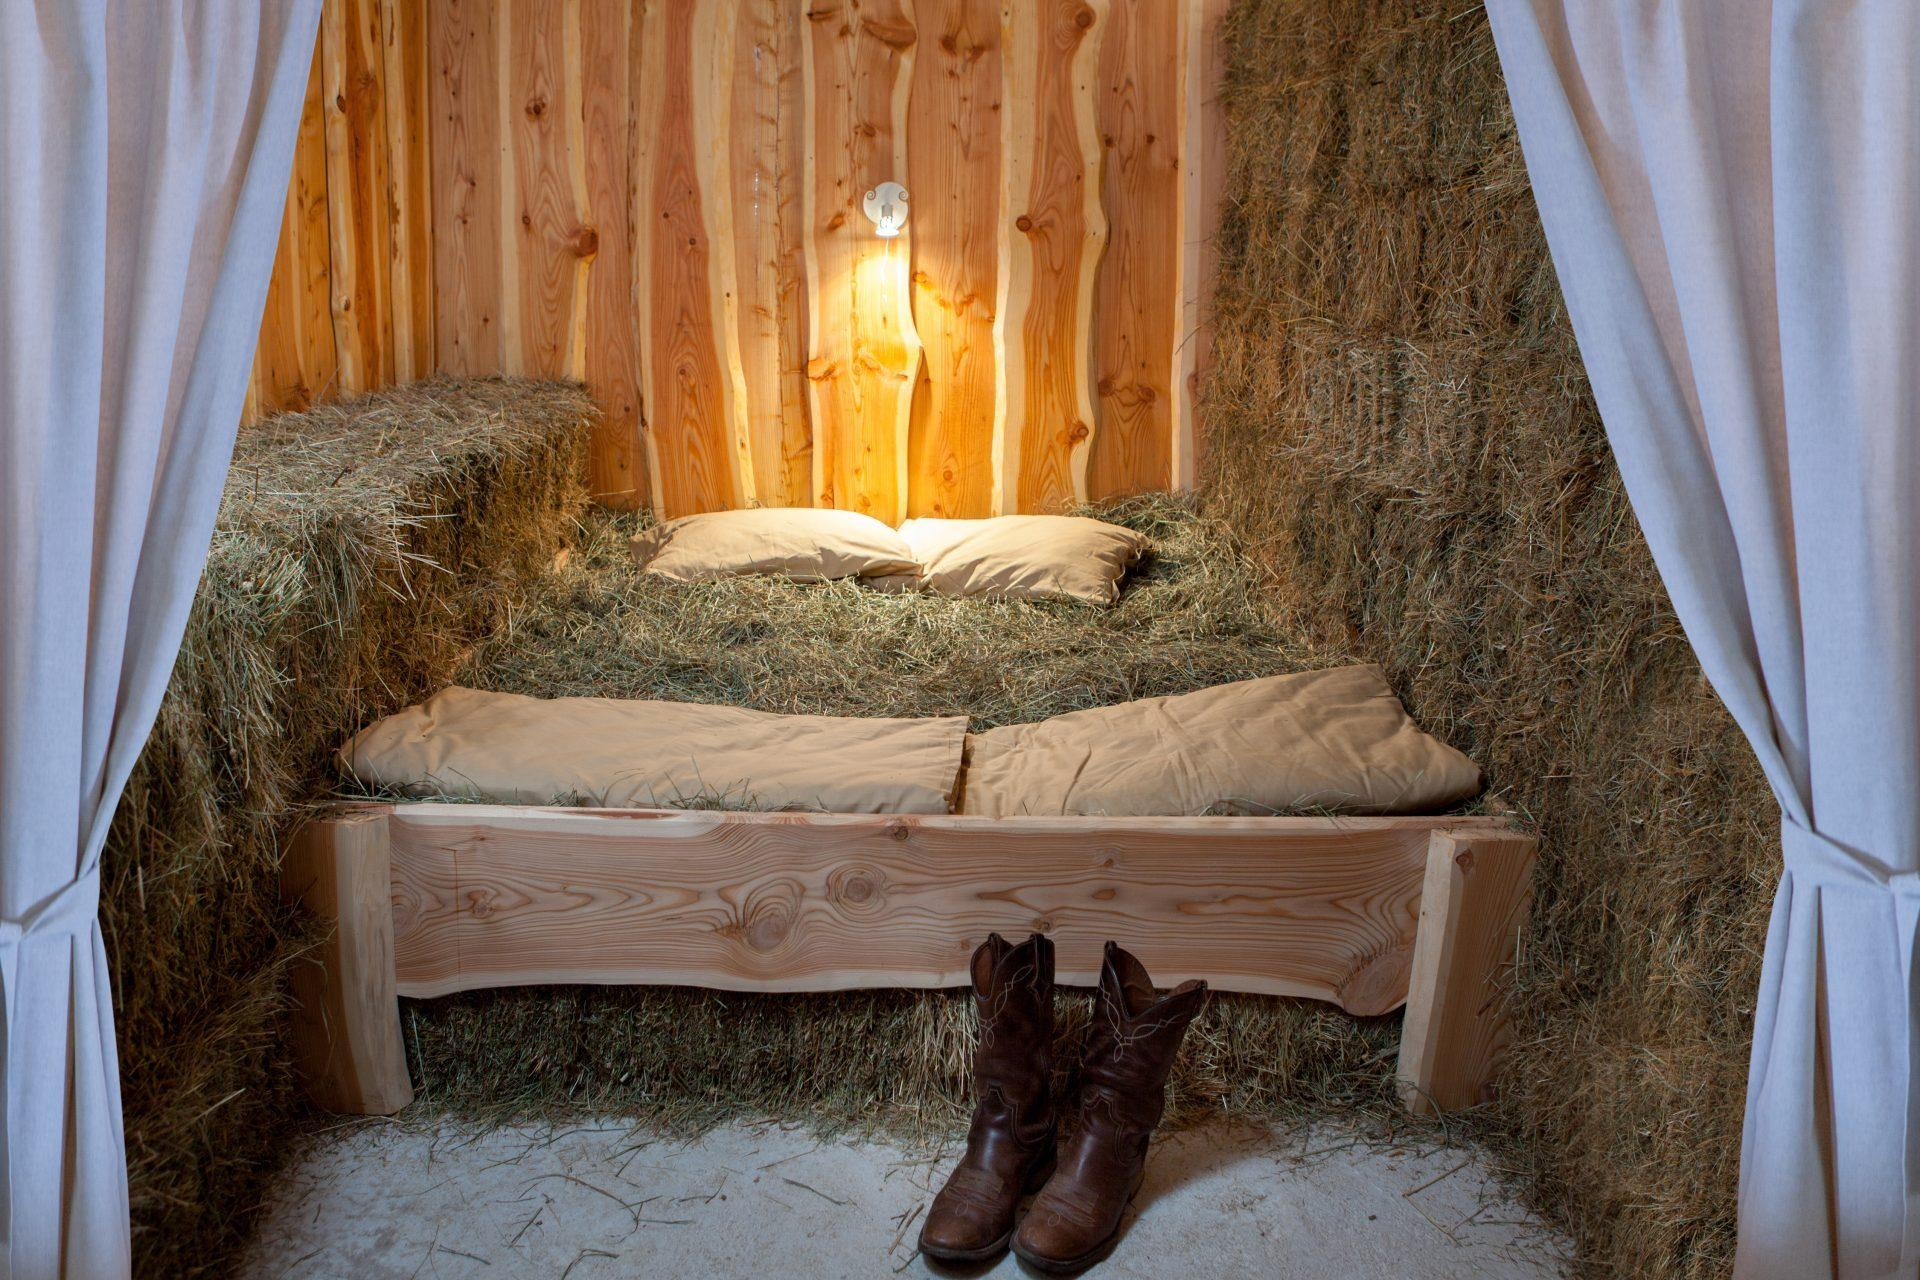 Sleeping on the hay experience Slovenia